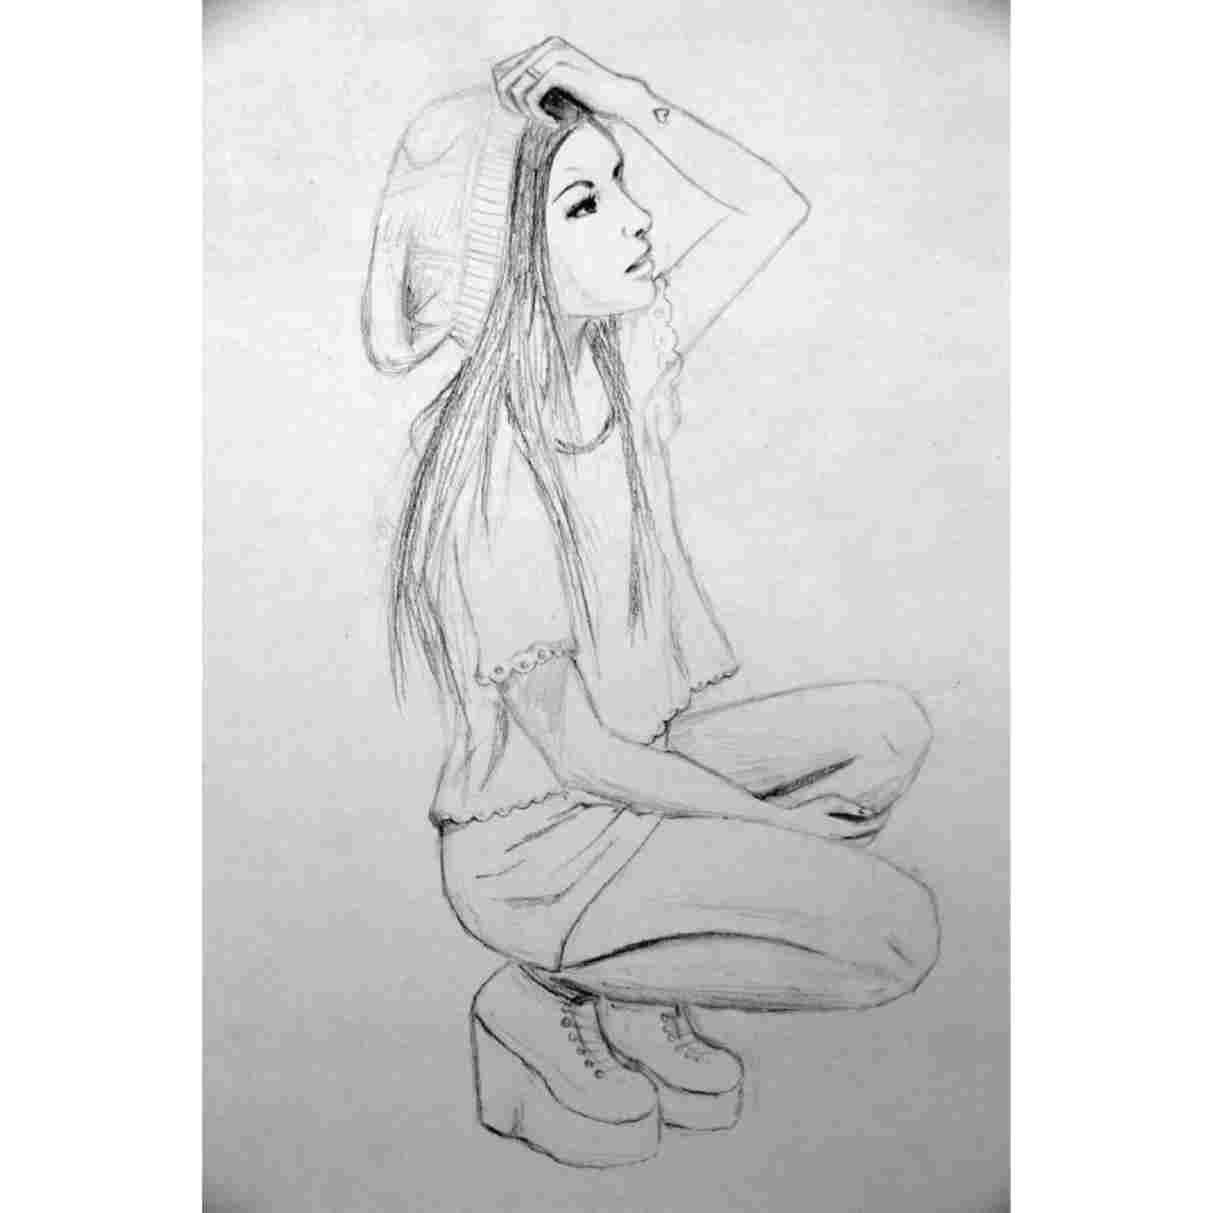 cute drawings for teens od zuzia na w pinterest art i artworkrhpinterestcom how to draw cartoon people chibi girl fundraw youtuberhyoutubecom how cute drawings for teens jpg